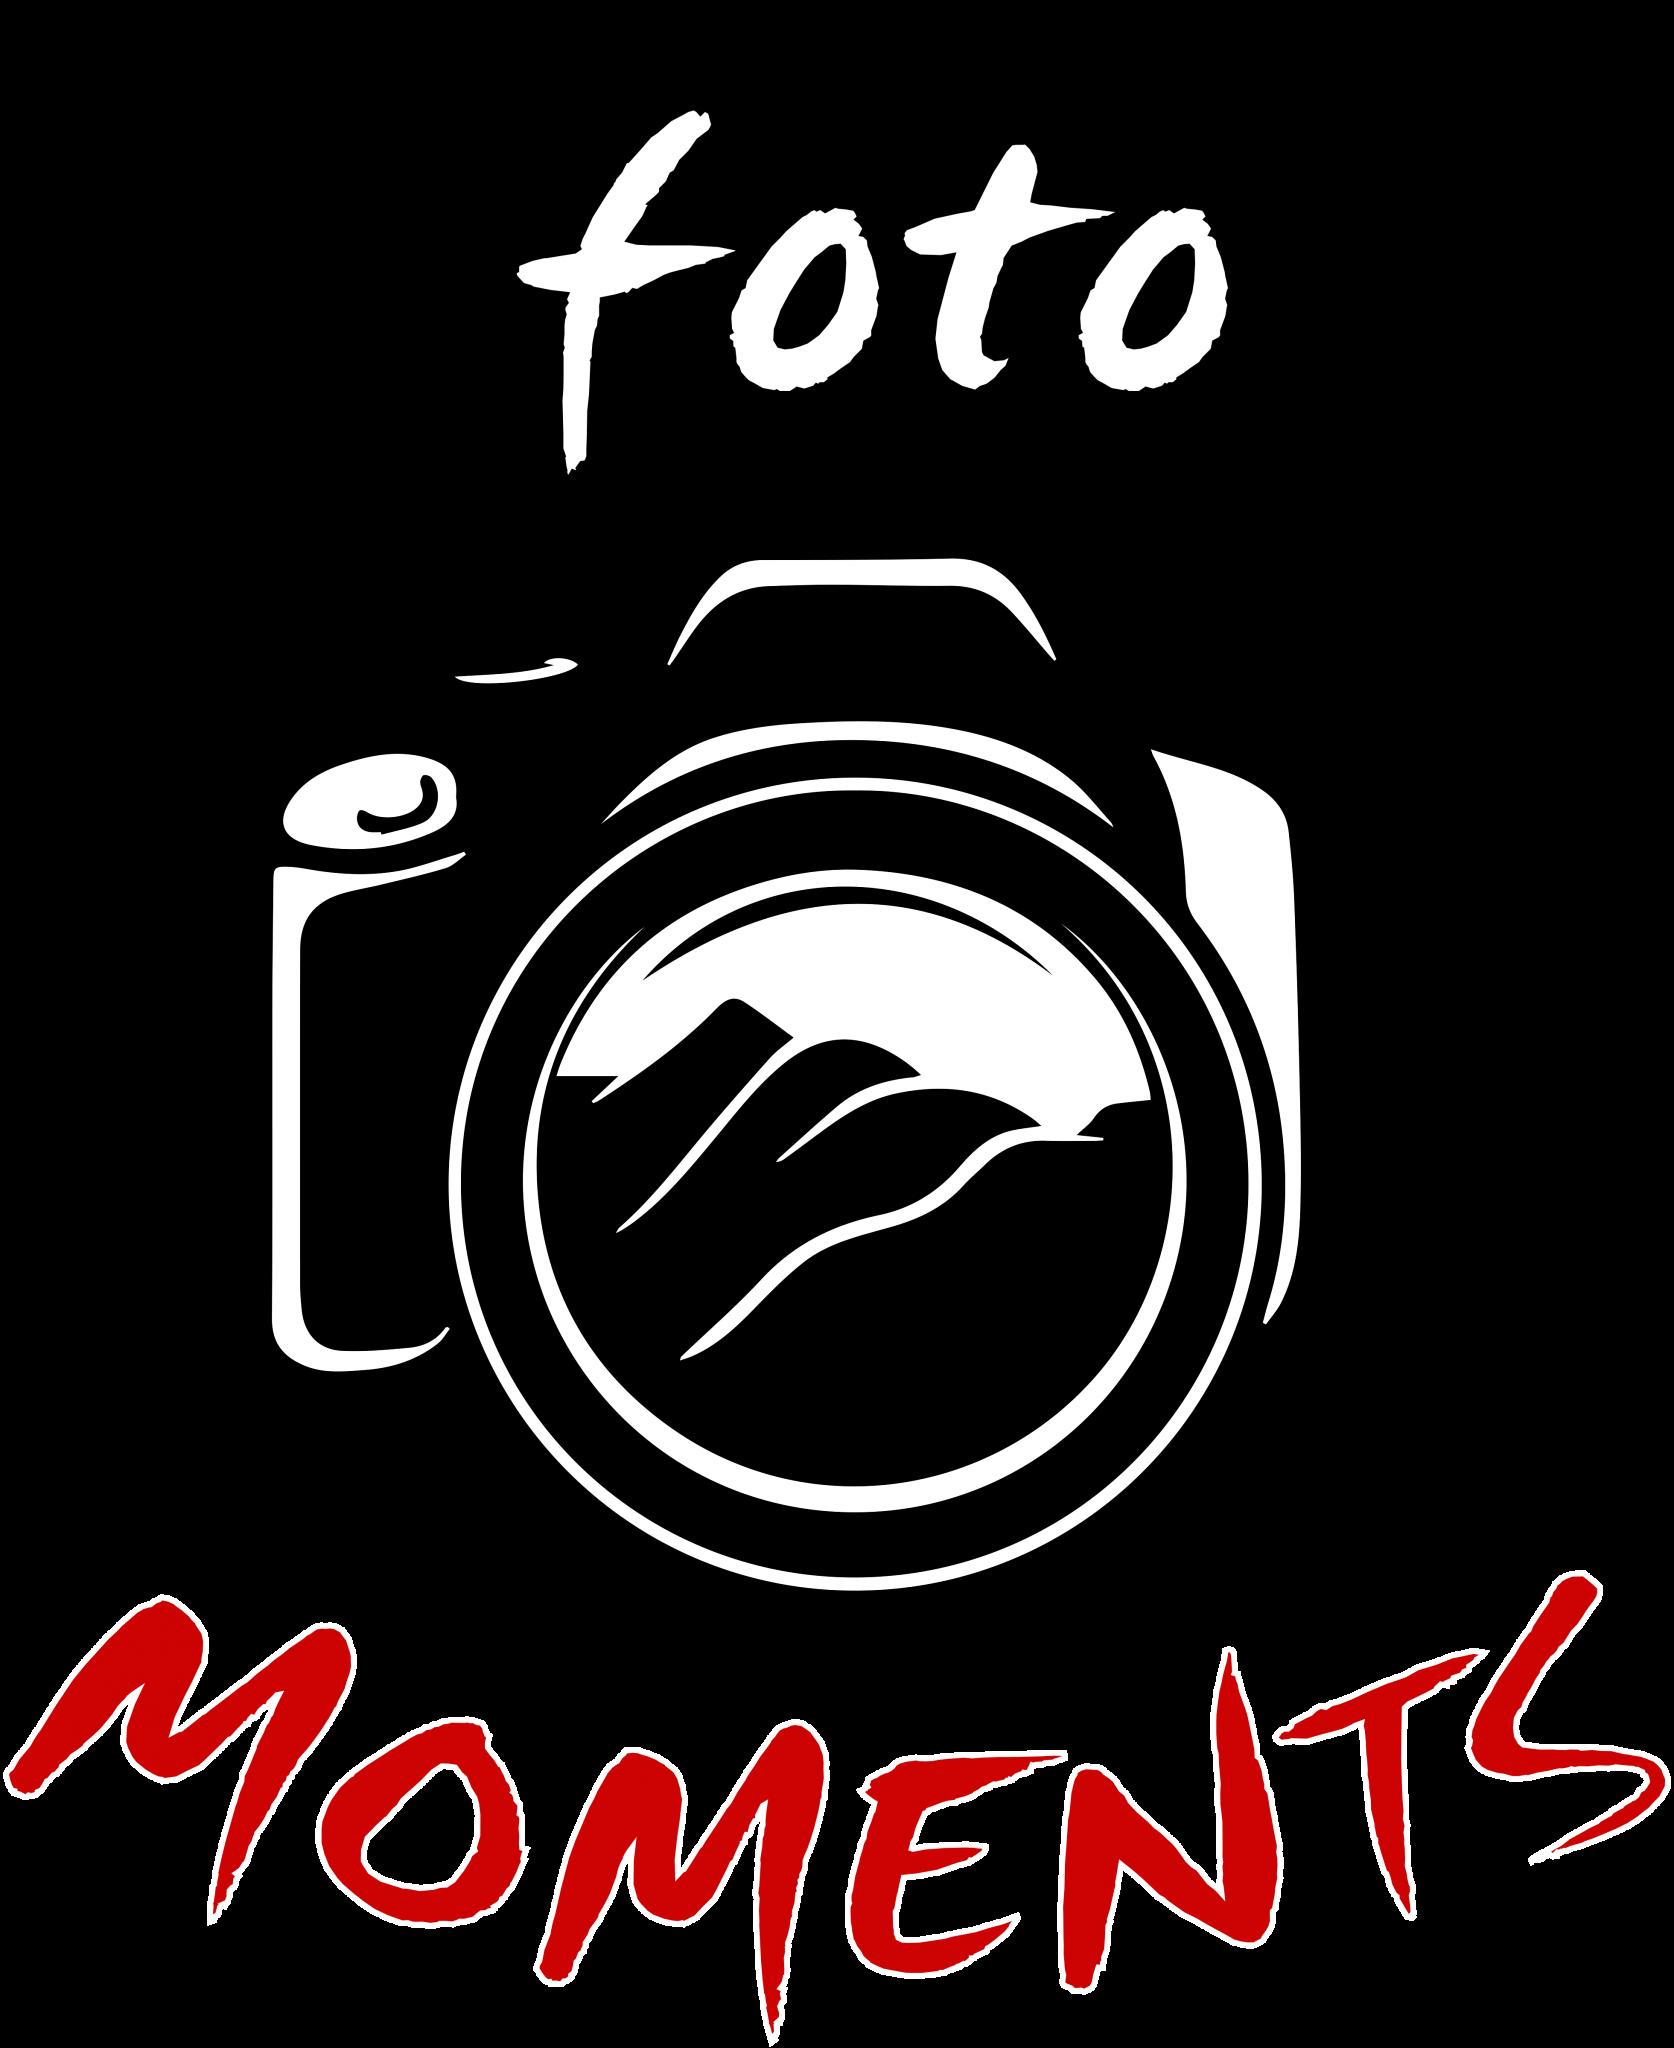 logo foto moments